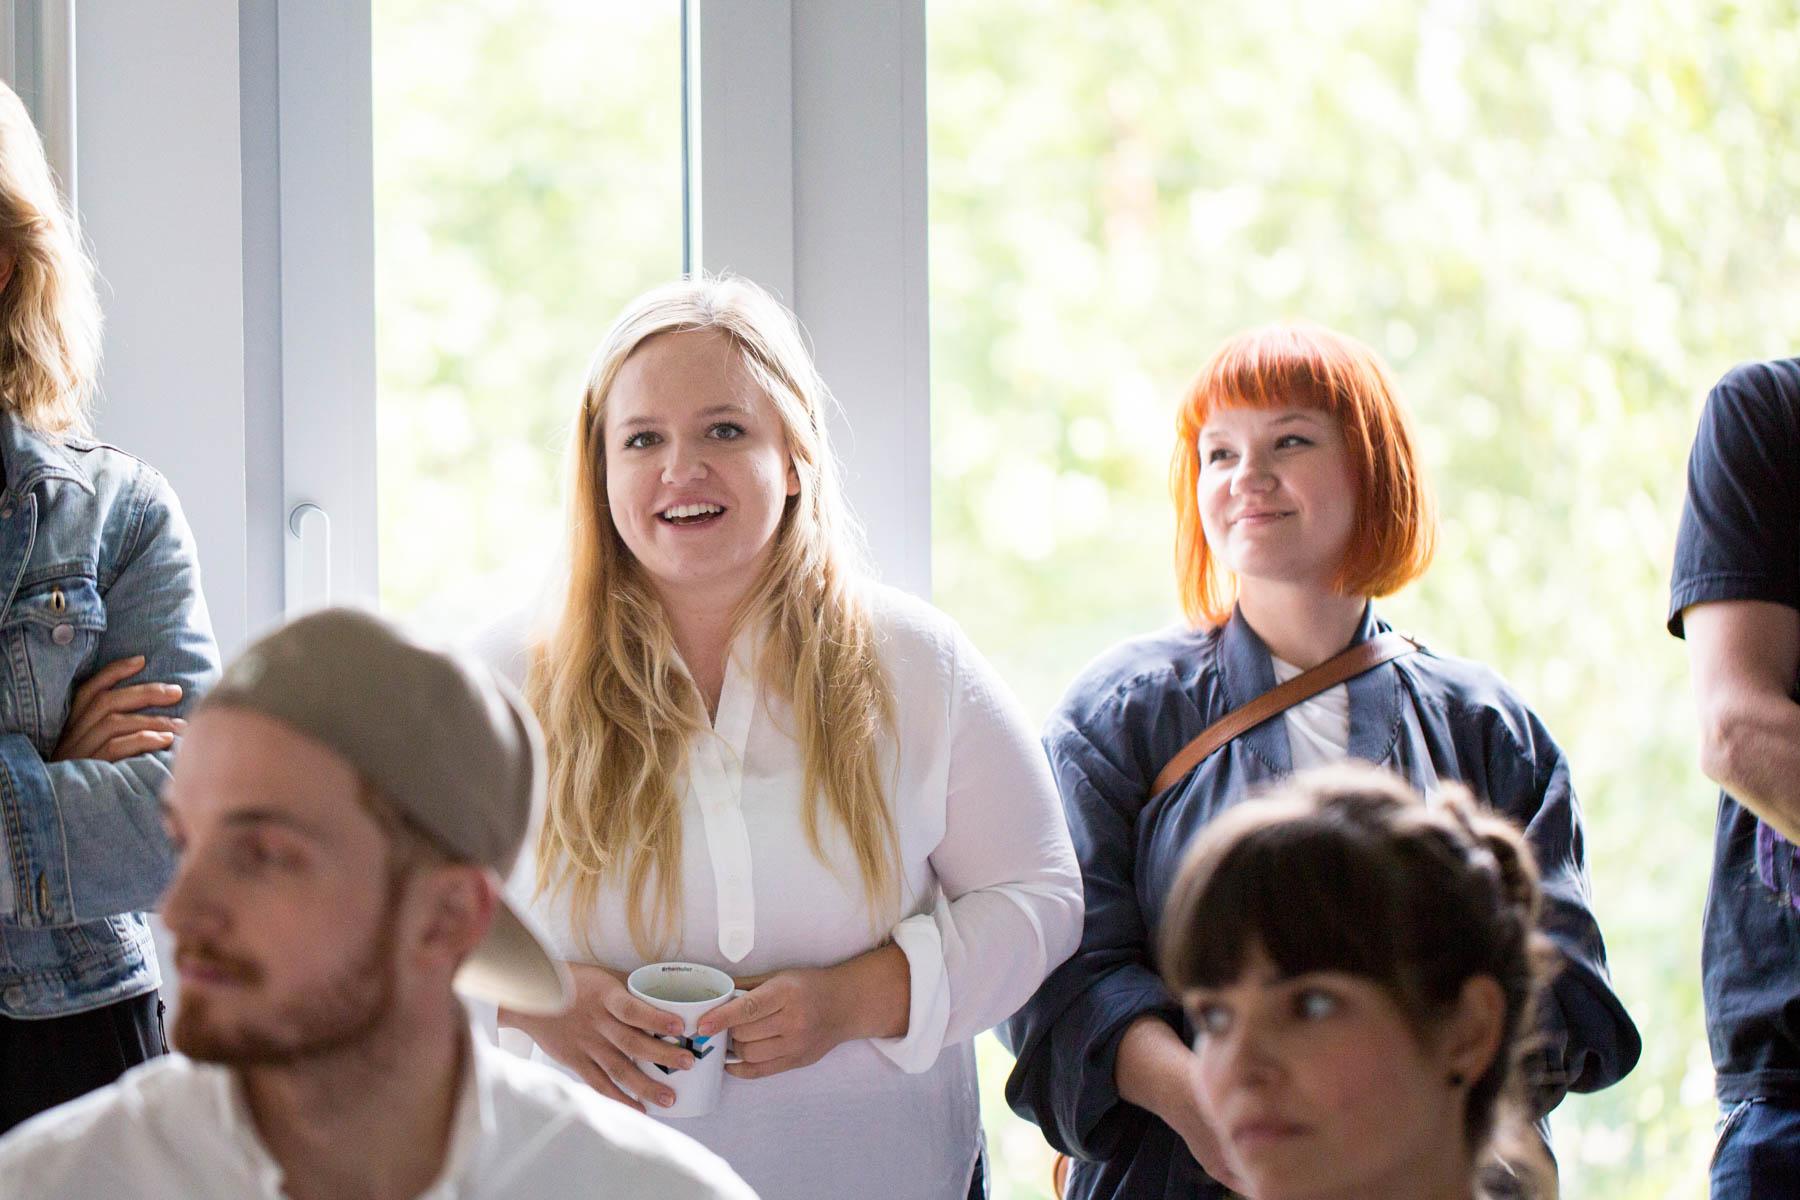 creative mornings köln vortrag frühstück grandceantrix Michaela Berghaus Veronica Garcia frage zuschauerin frau blond lachend jörn strojny